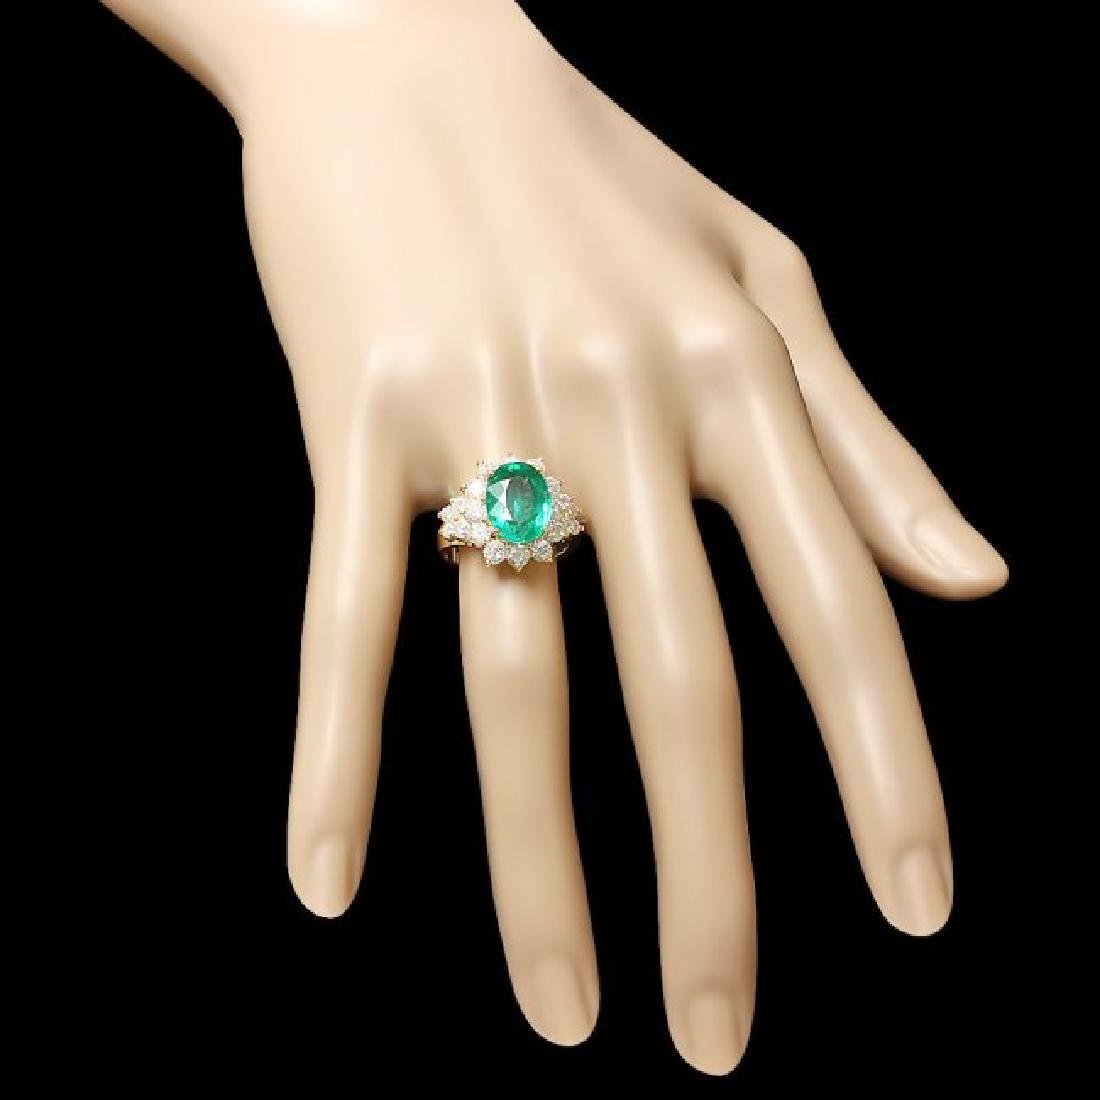 14k Gold 4.00ct Emerald 1.75ct Diamond Ring - 3